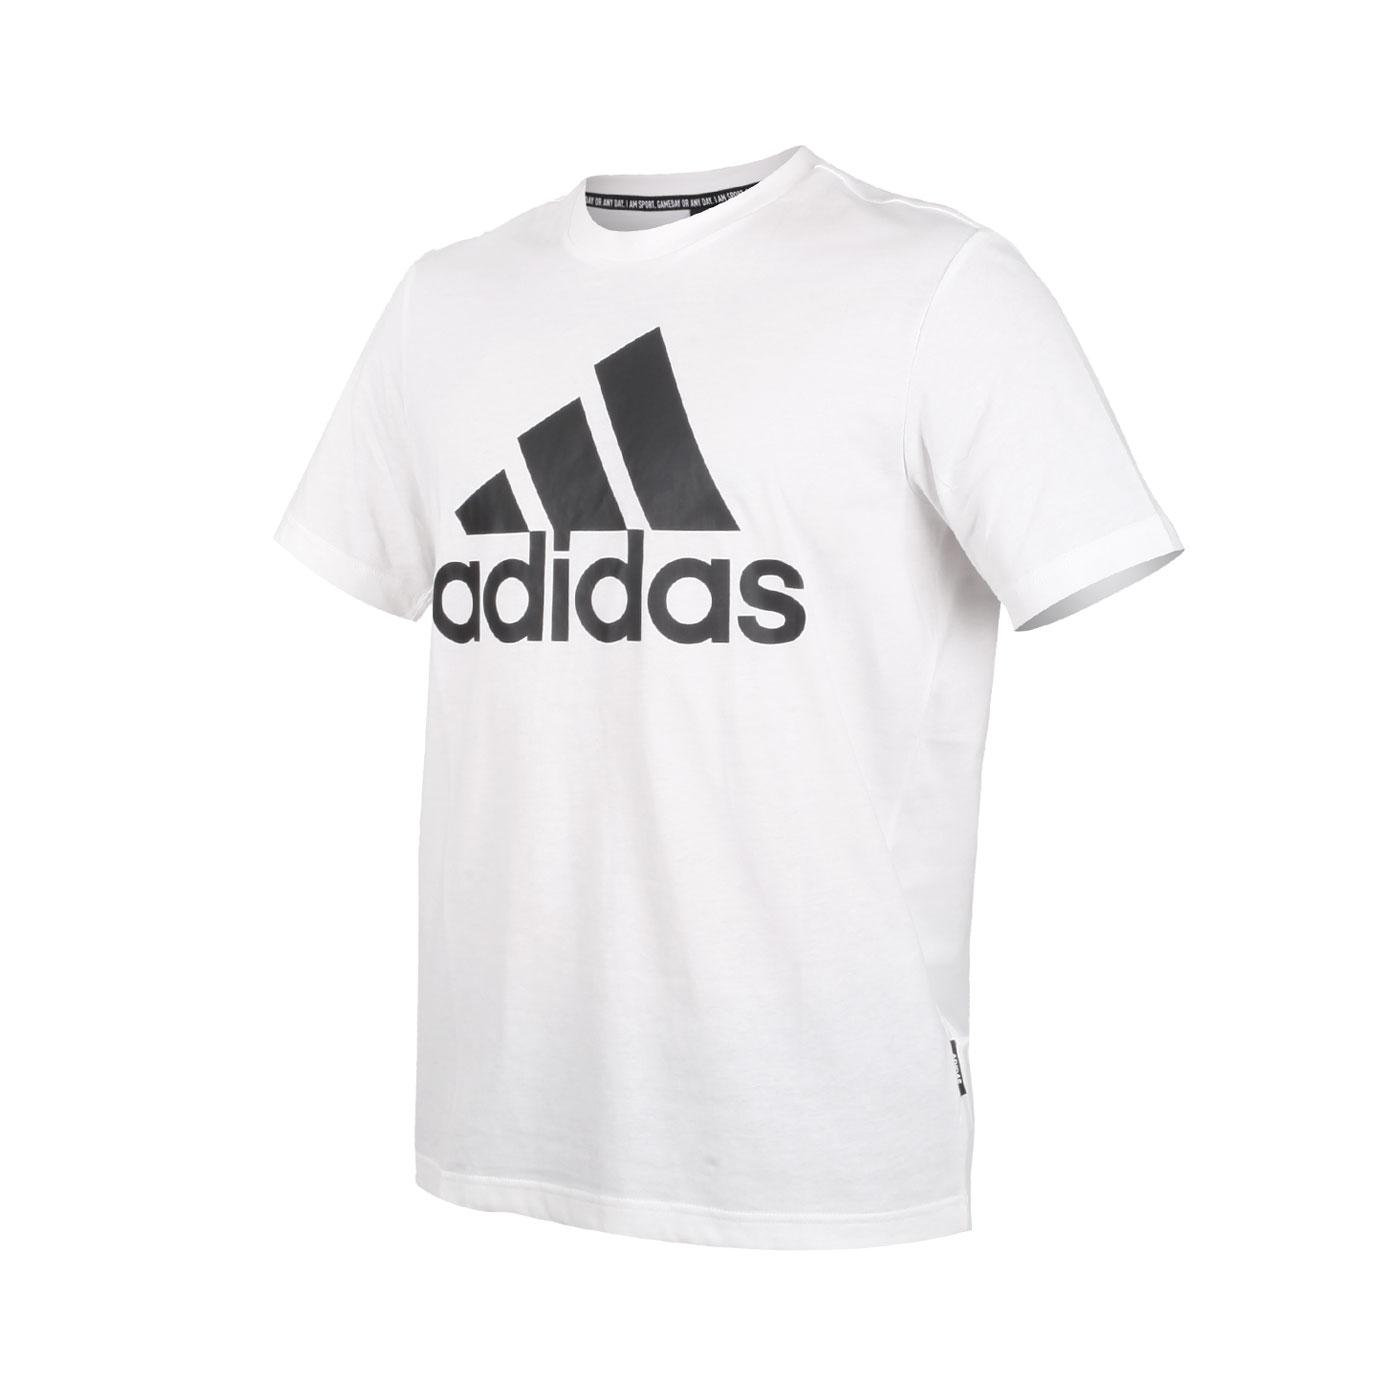 ADIDAS 男款短袖T恤 GC7348